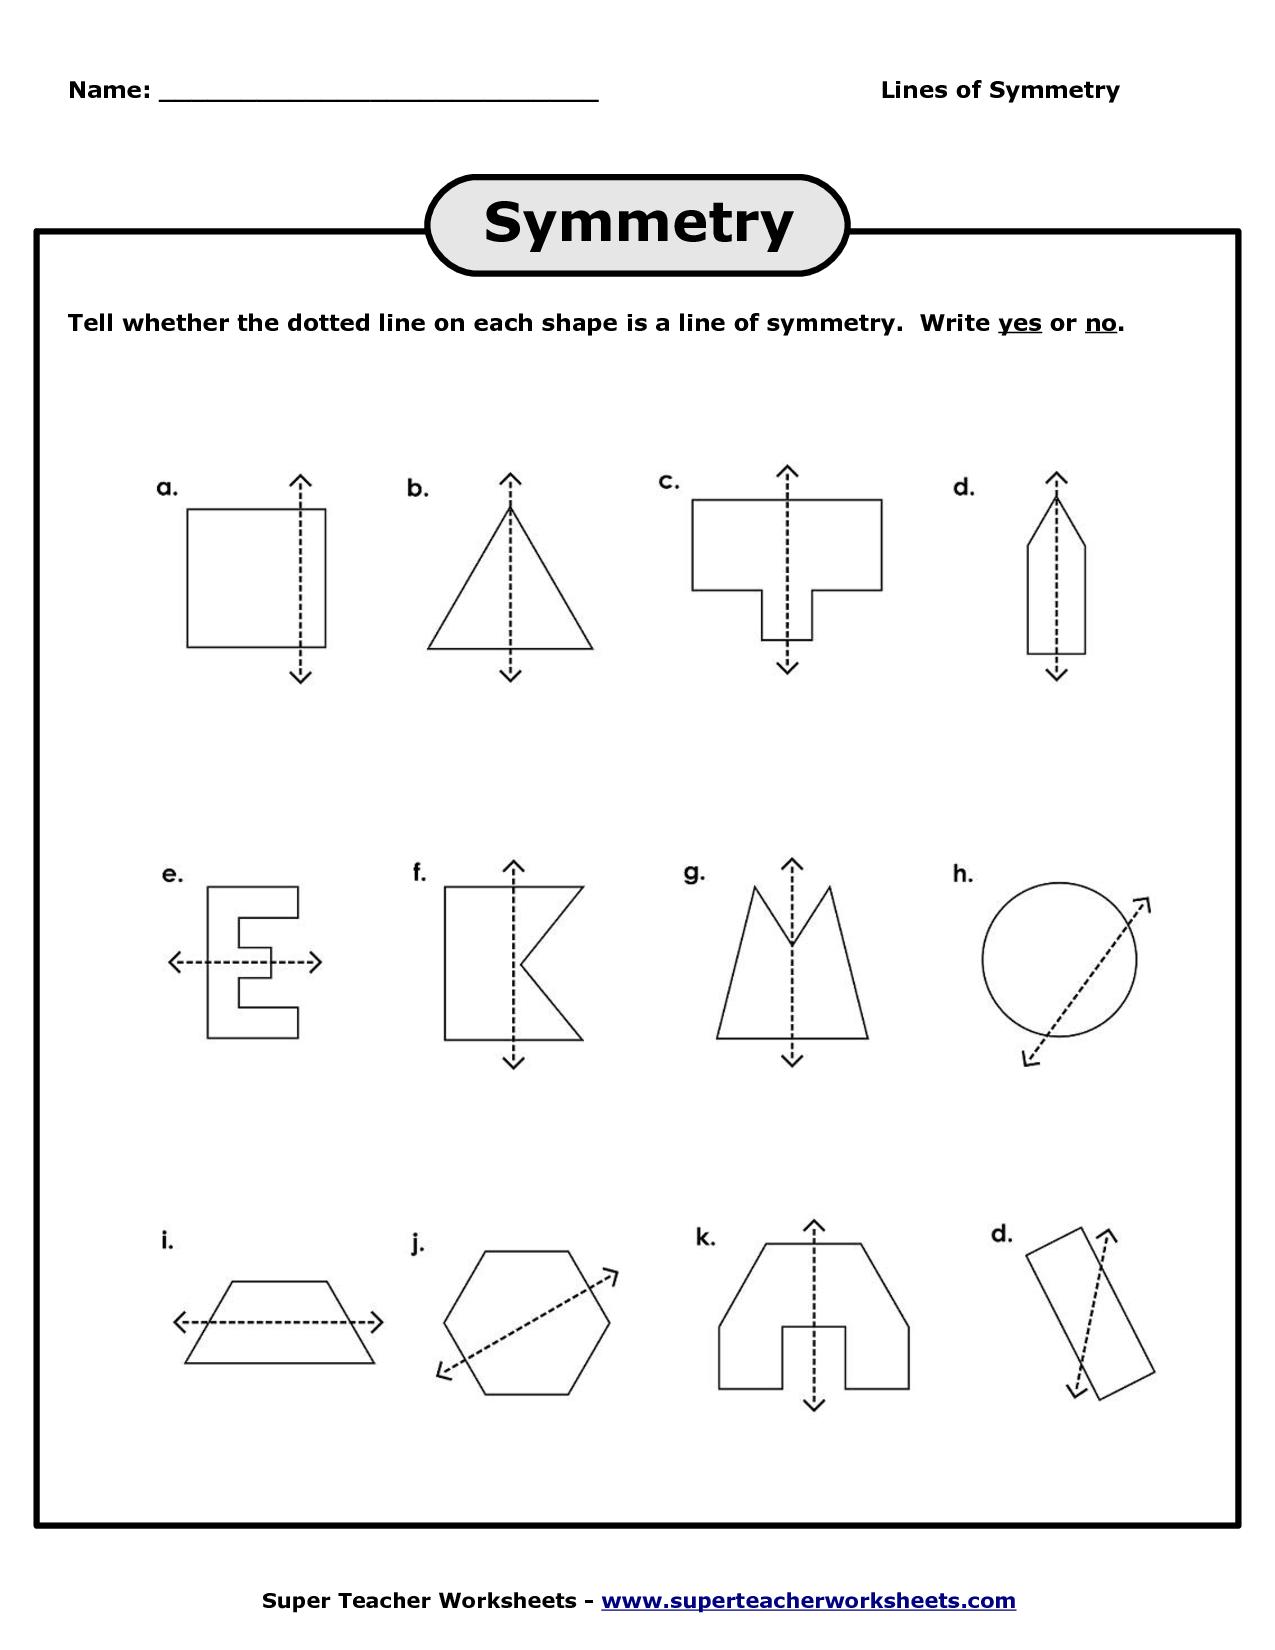 B clipart symmetrical figure. Lines of symmetry worksheets